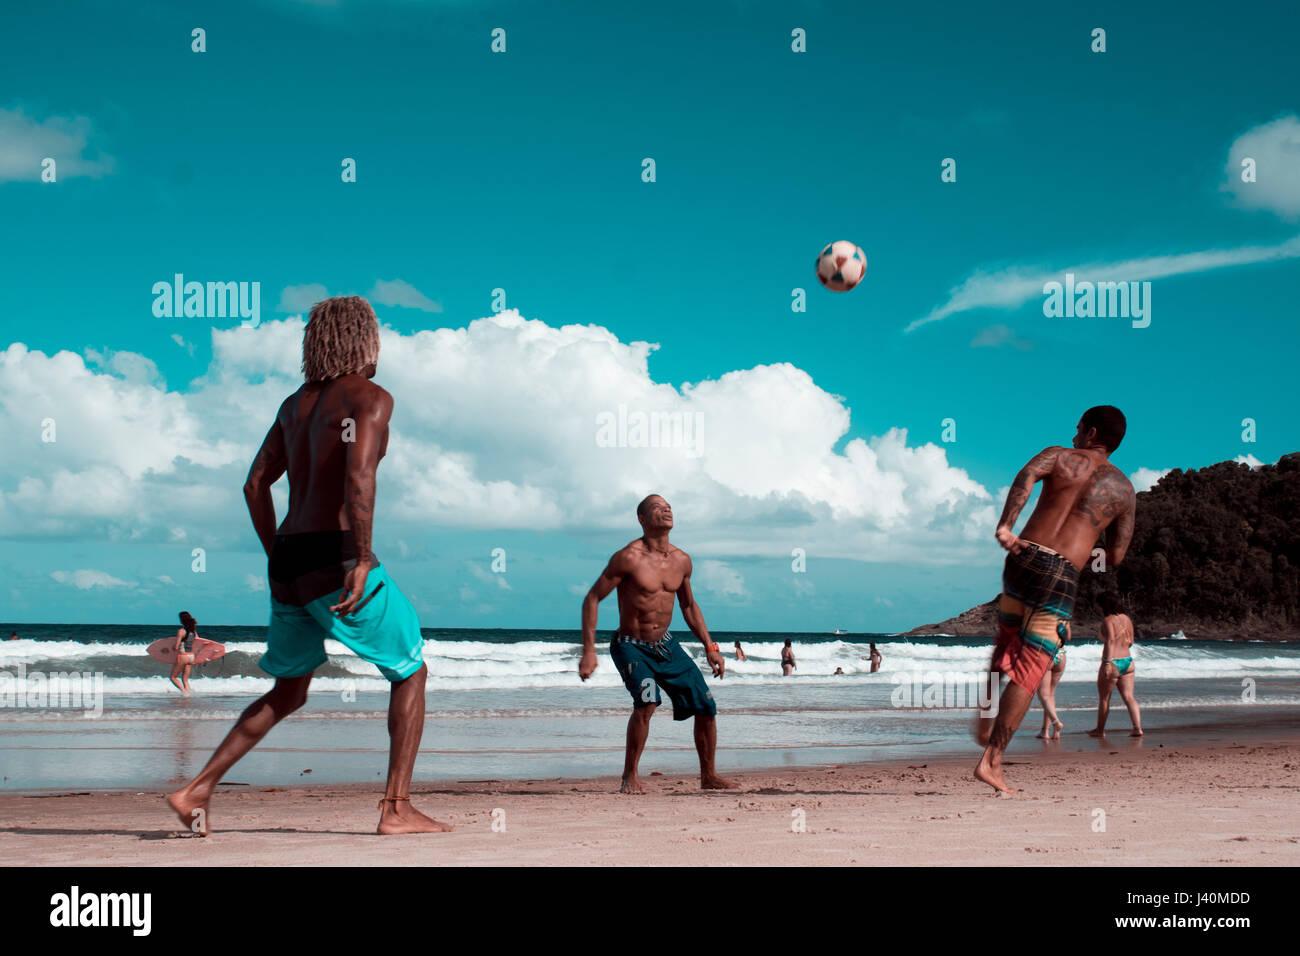 youth playing soccer and fottball on Tiririca beach, Itacare, Bahia, Brazil - Stock Image